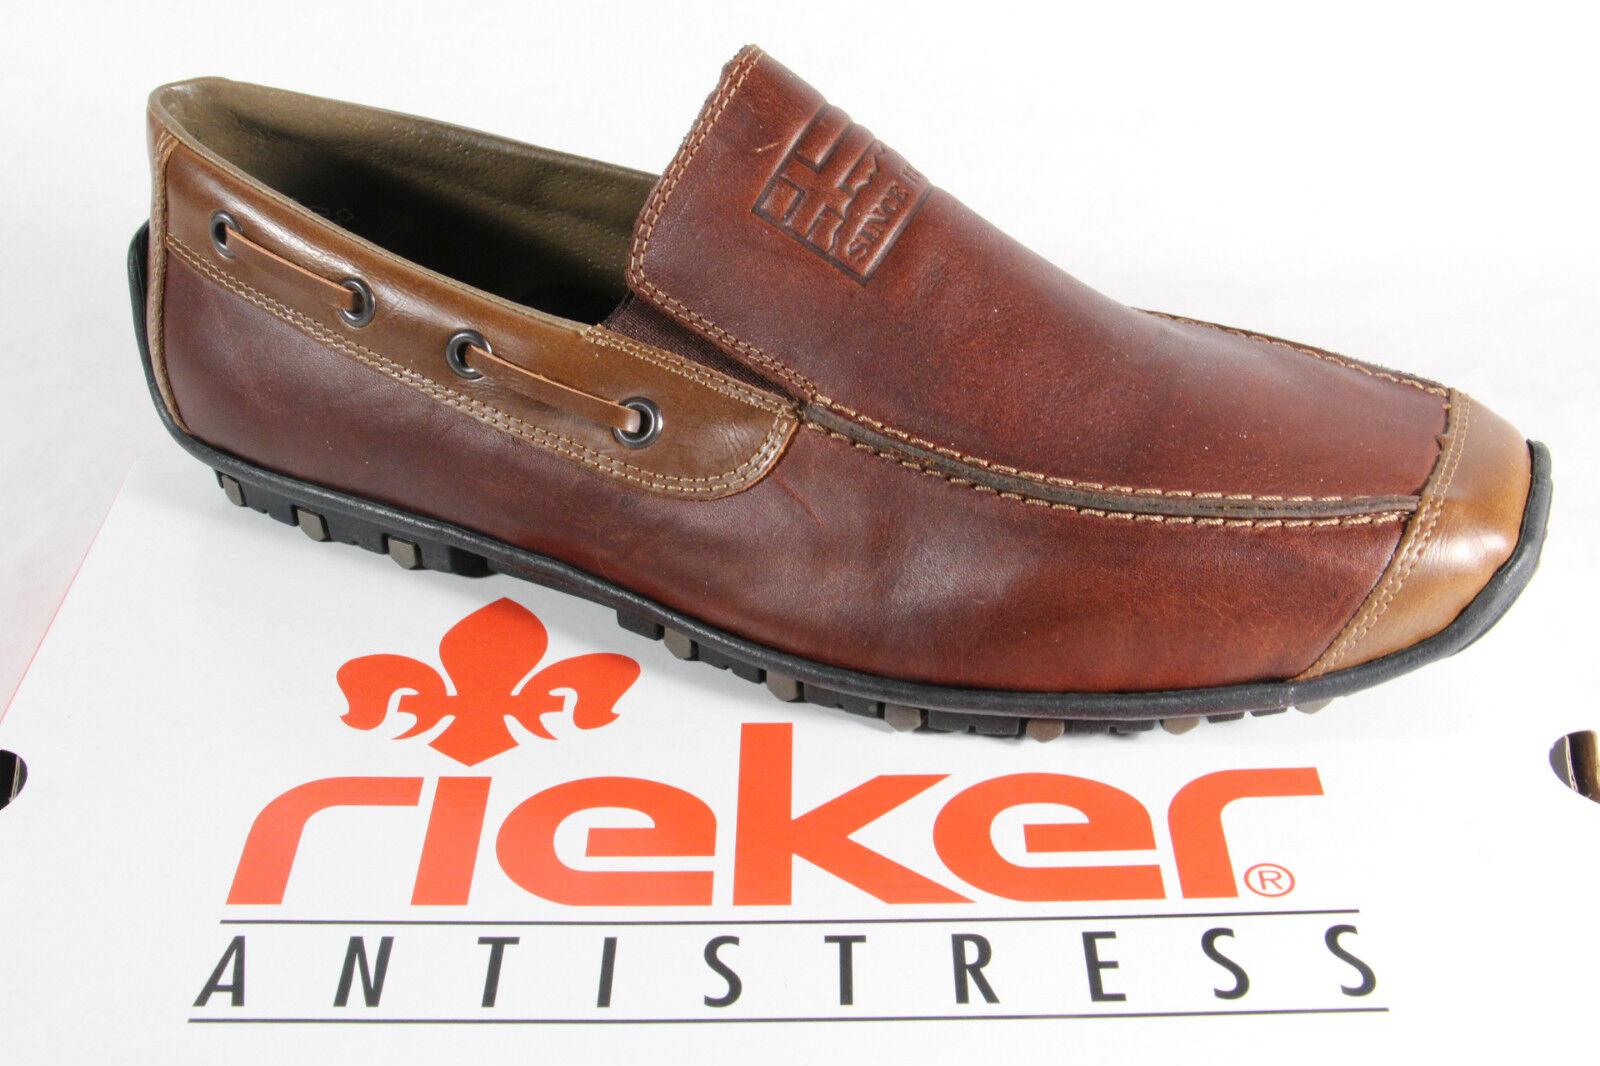 Rieker Herren Slipper Sneakers Halbschuhe braun Echtleder